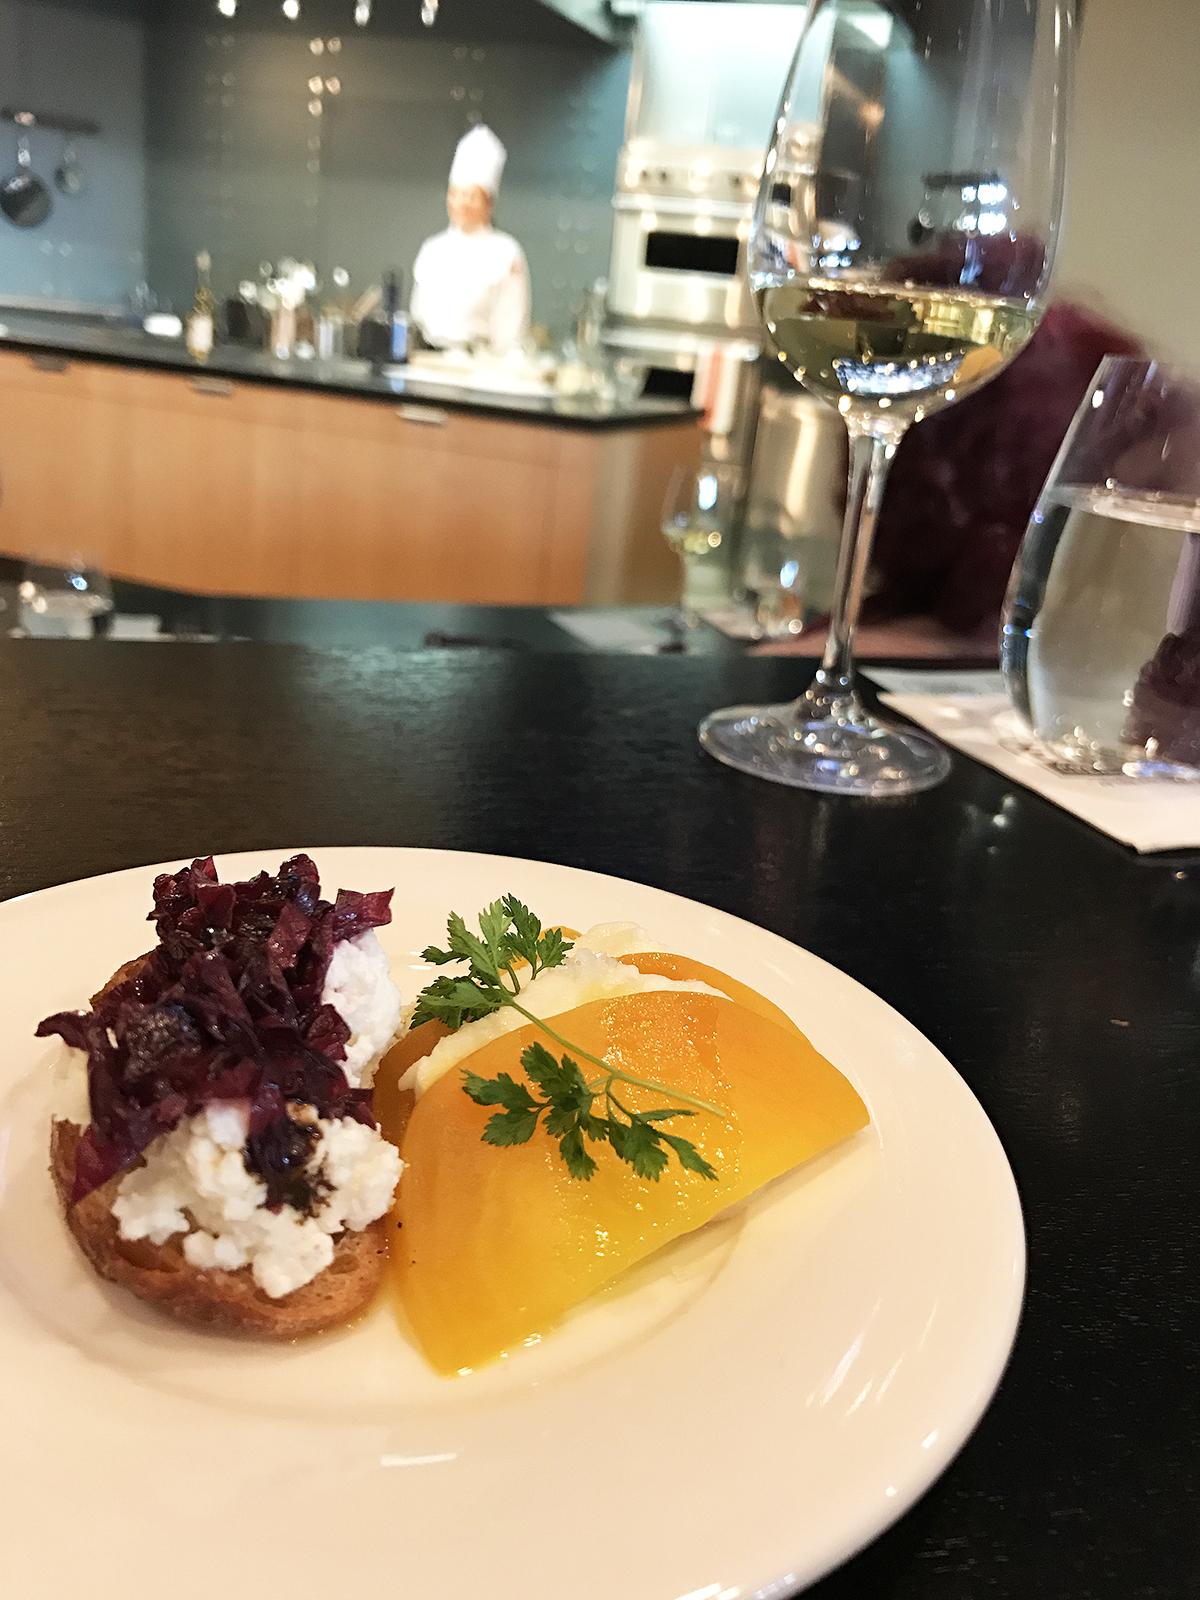 The Culinary Institute of America at Copia